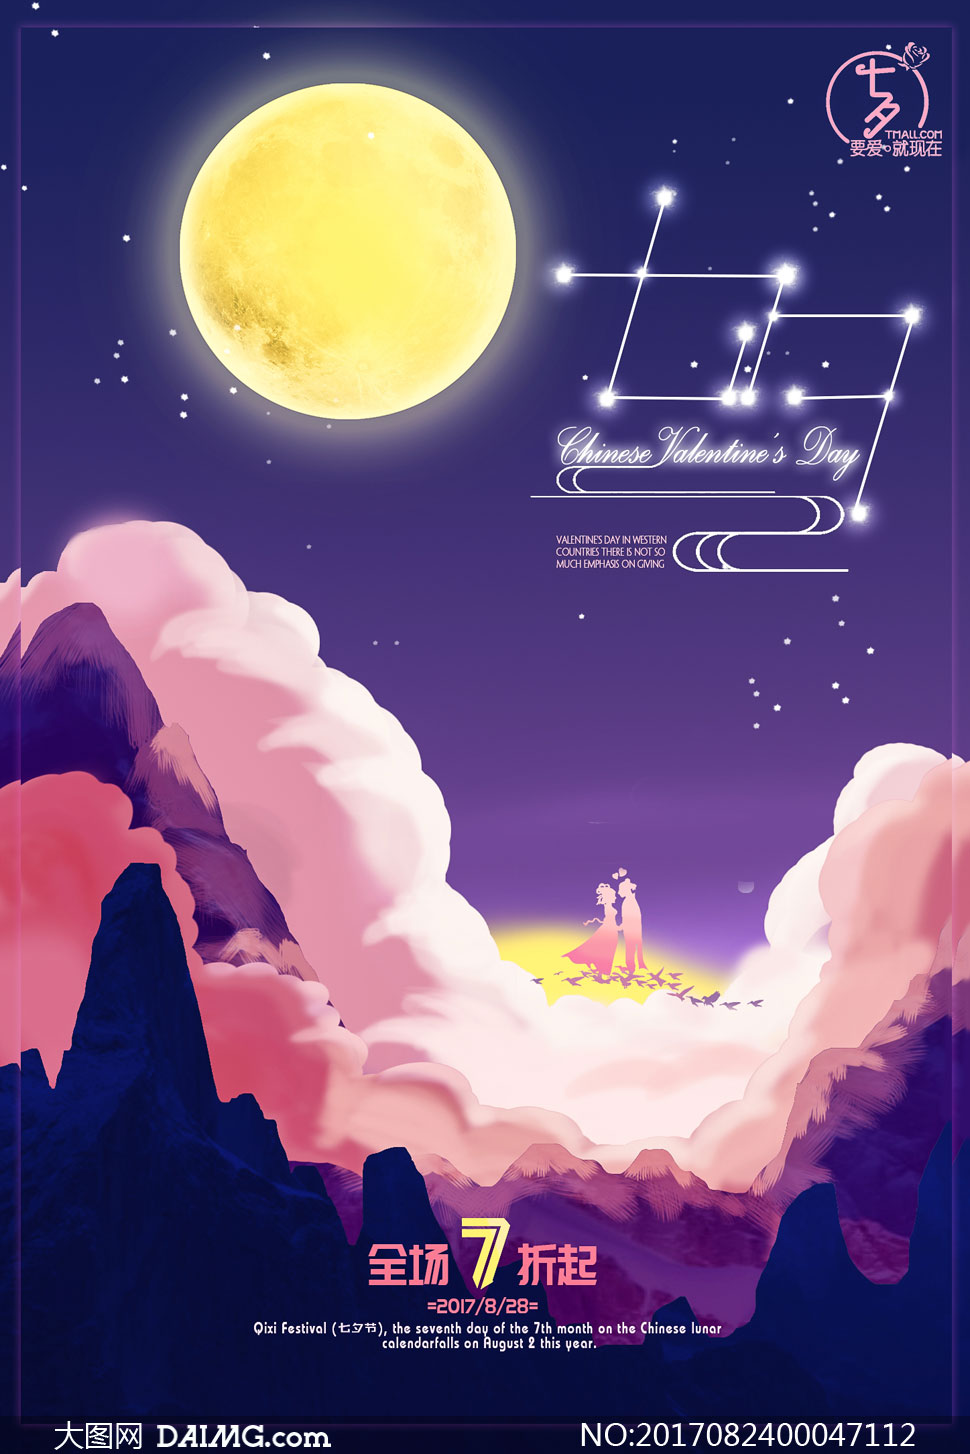 ps海报素材大图_电商七夕情人节海报设计PS教程素材_大图网图片素材